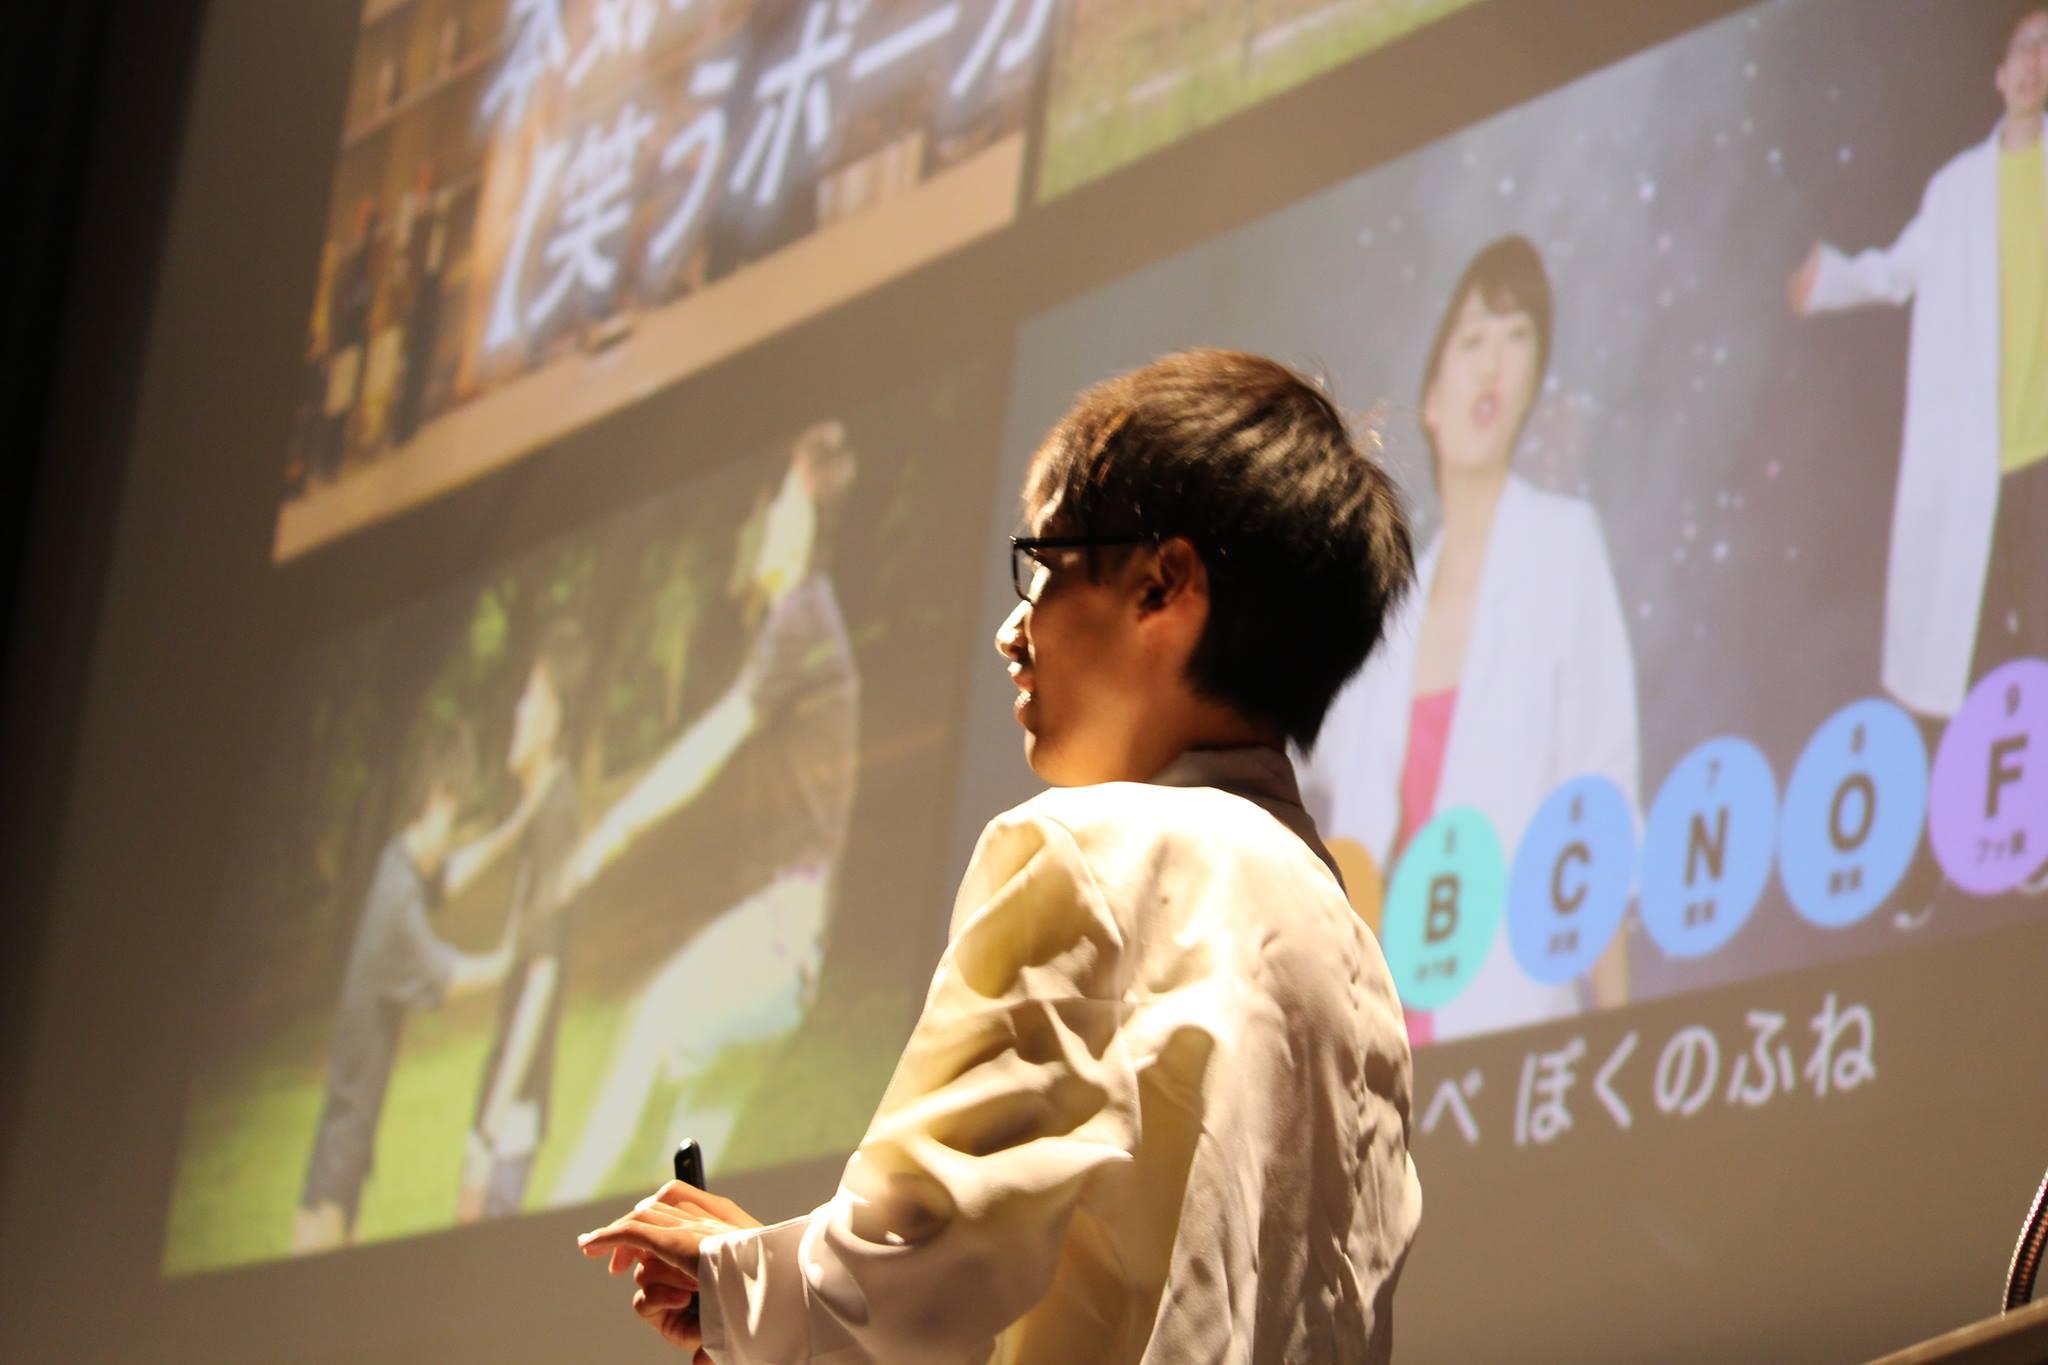 MONOVATE in Akihabaraでスピーチしてきました!